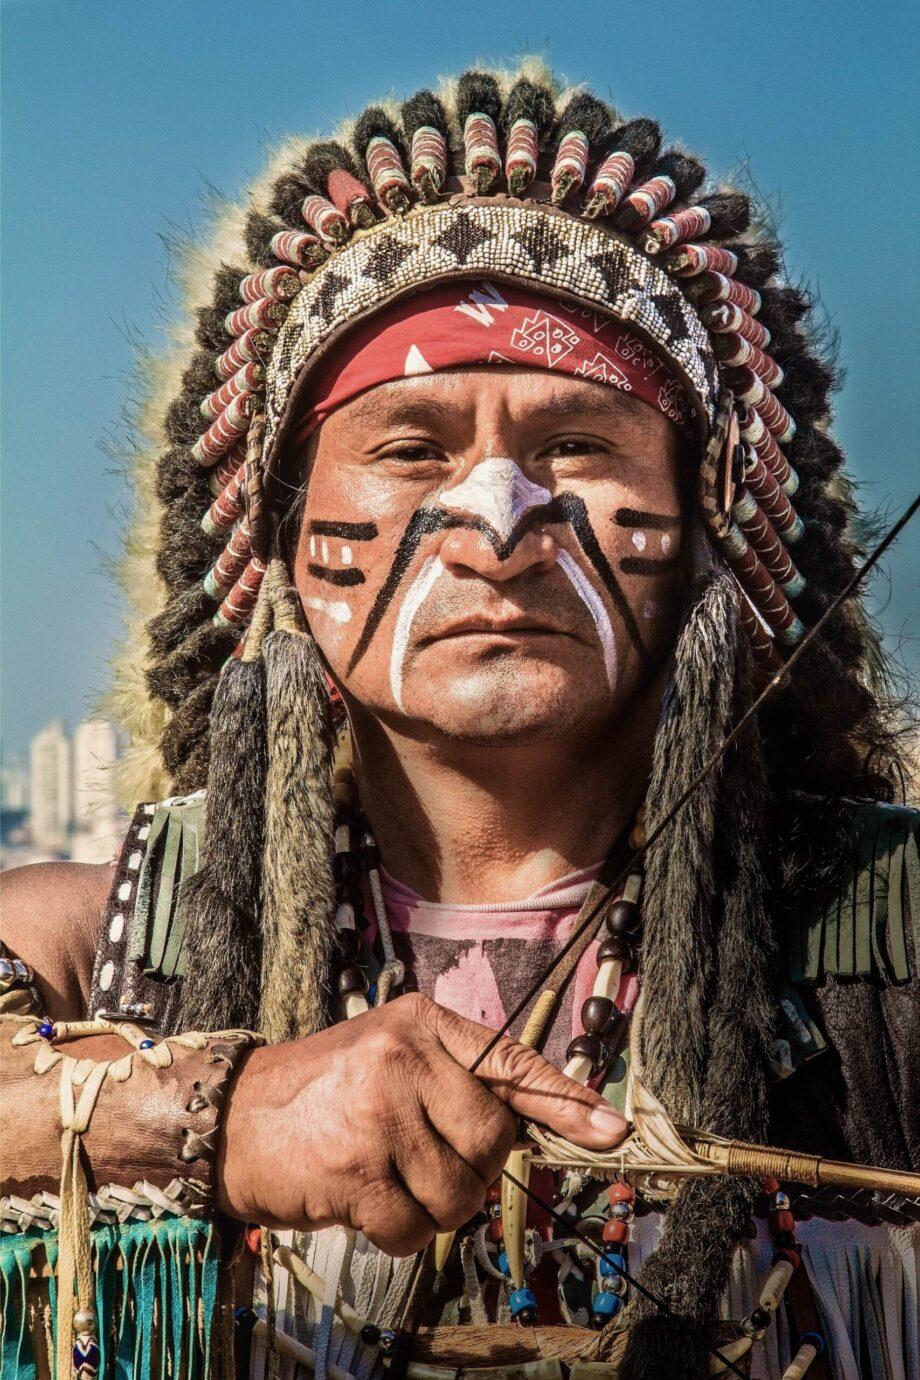 8946004323504_Ichio zd_Native American@0.5x-50